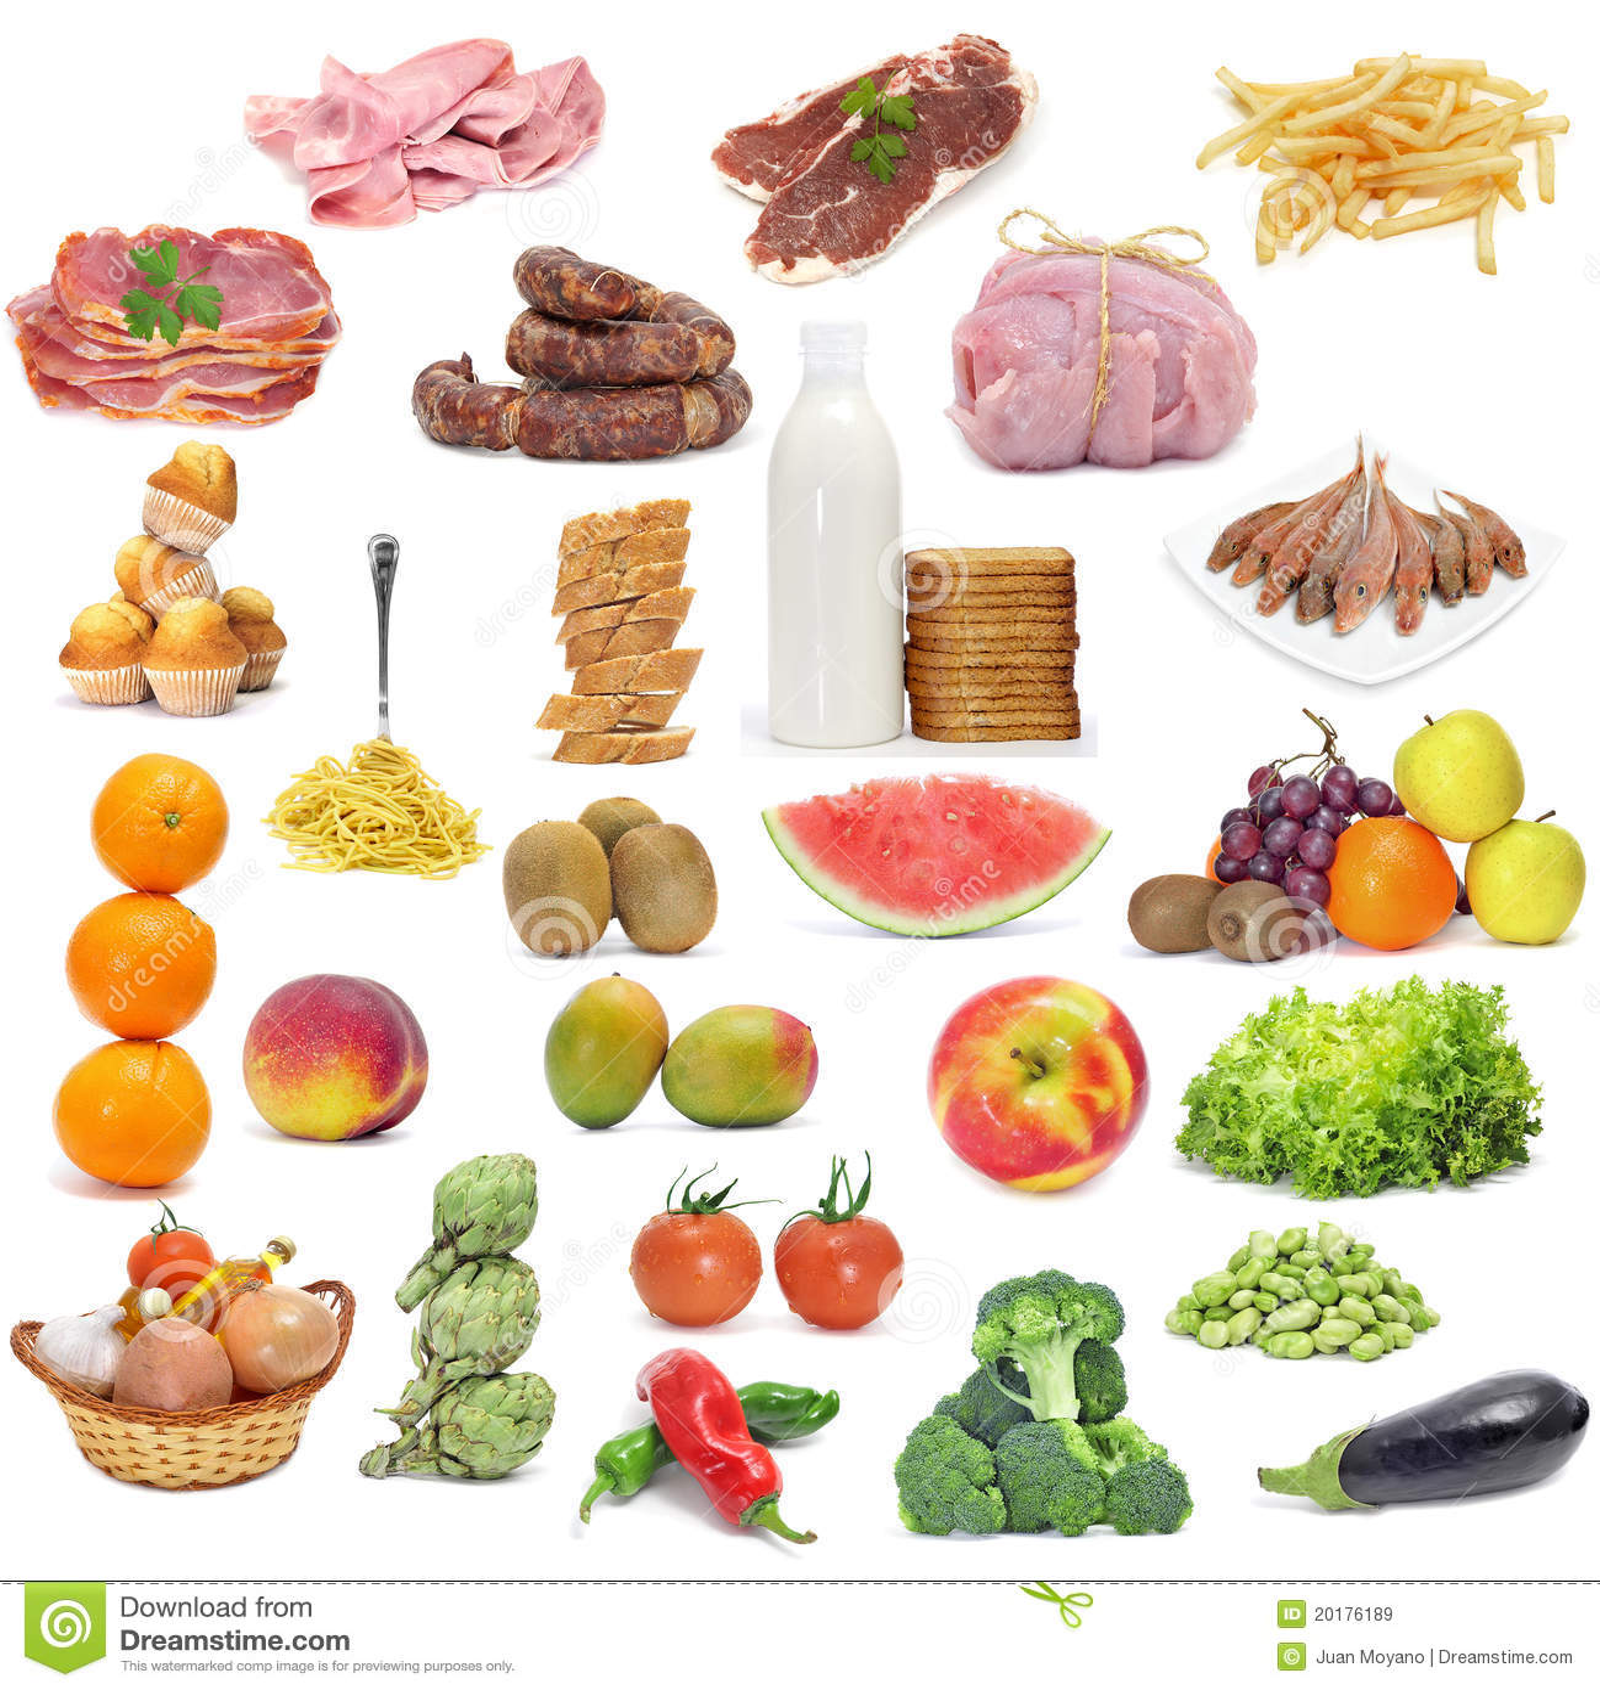 Varied diet stock image. Image of fish, milk, eggplant